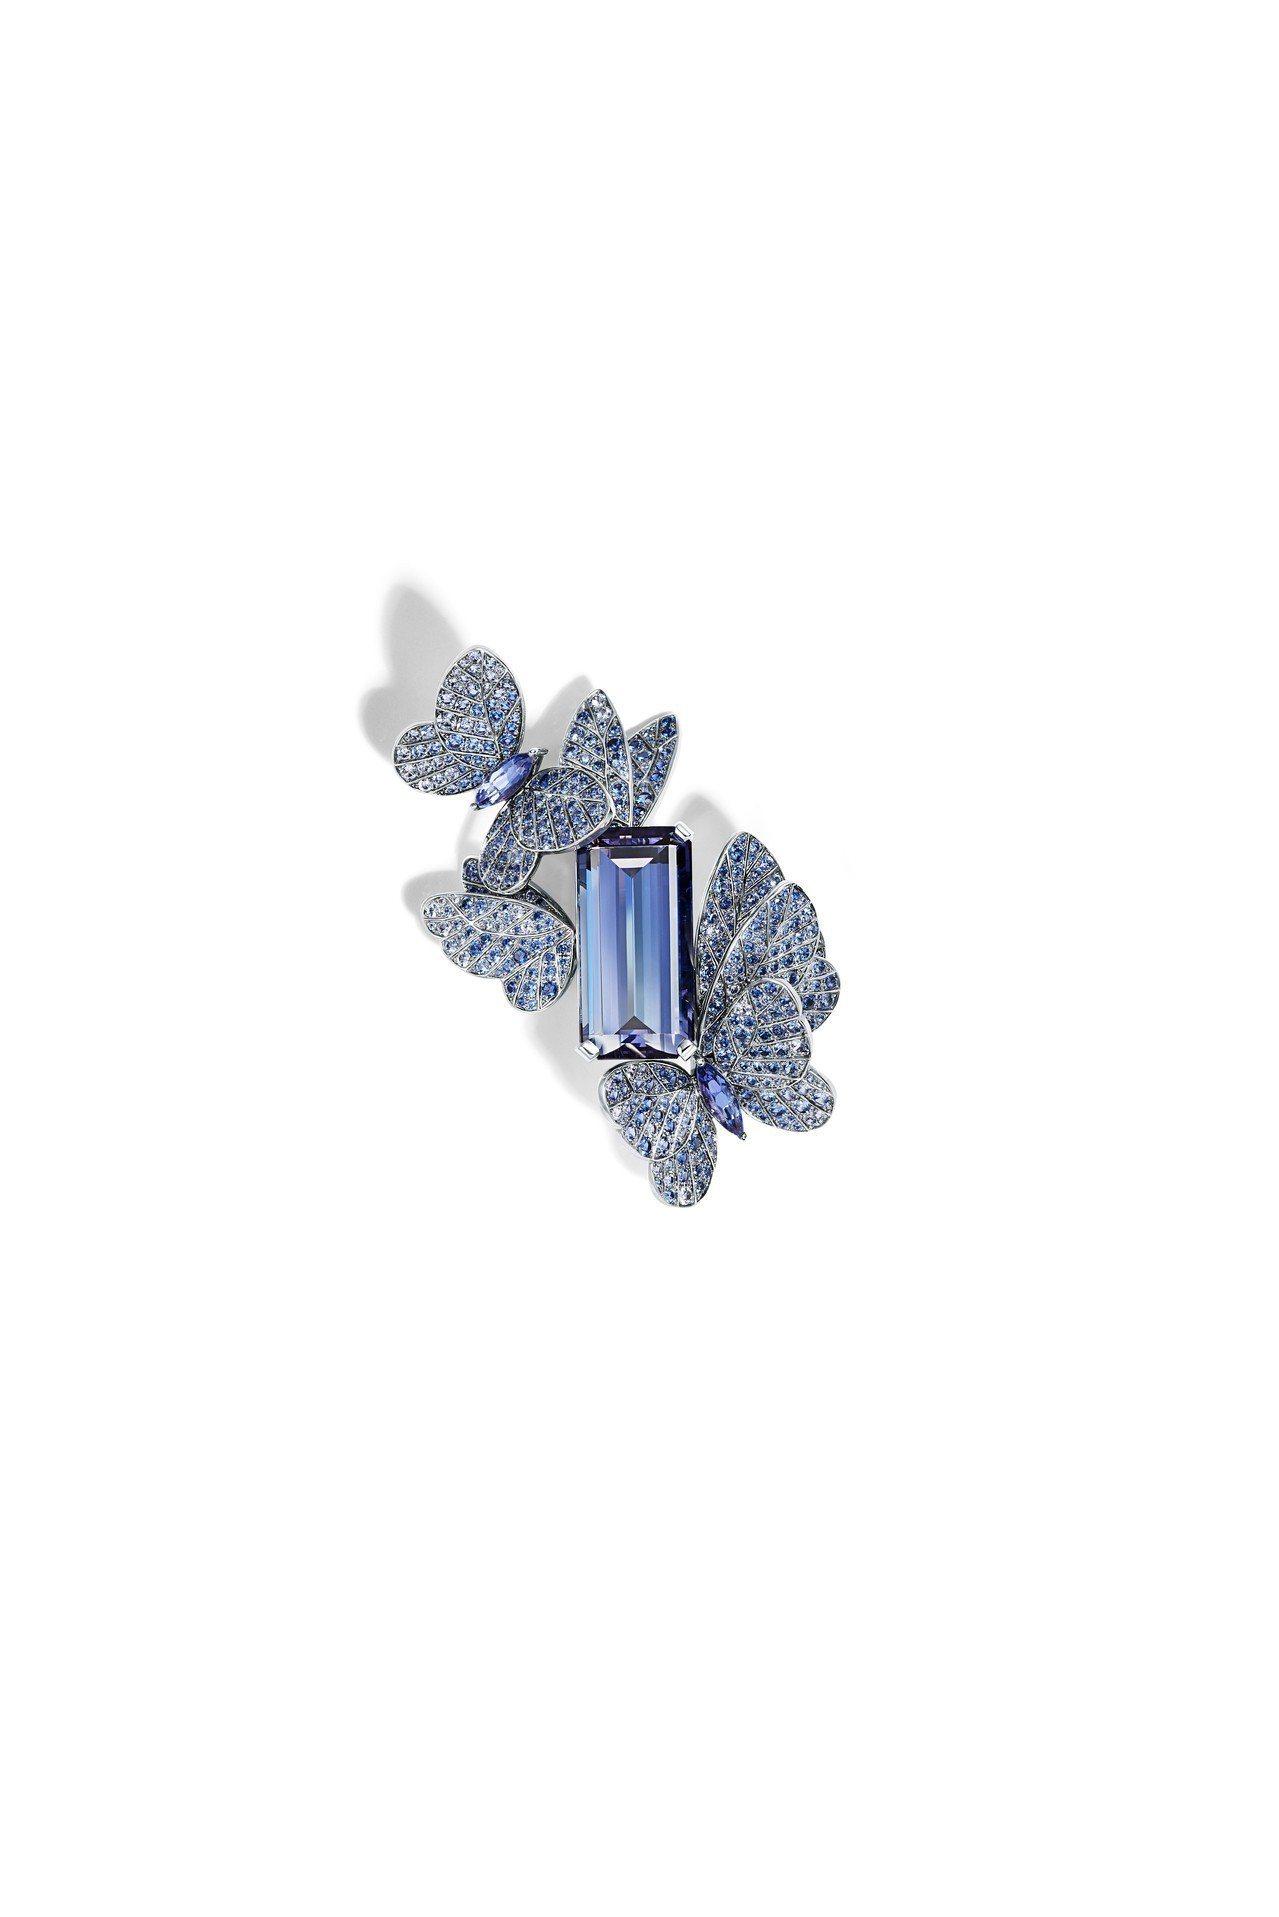 Tiffany 2018 Blue Book系列夏季主題,鉑金鑲嵌主石逾27克拉...